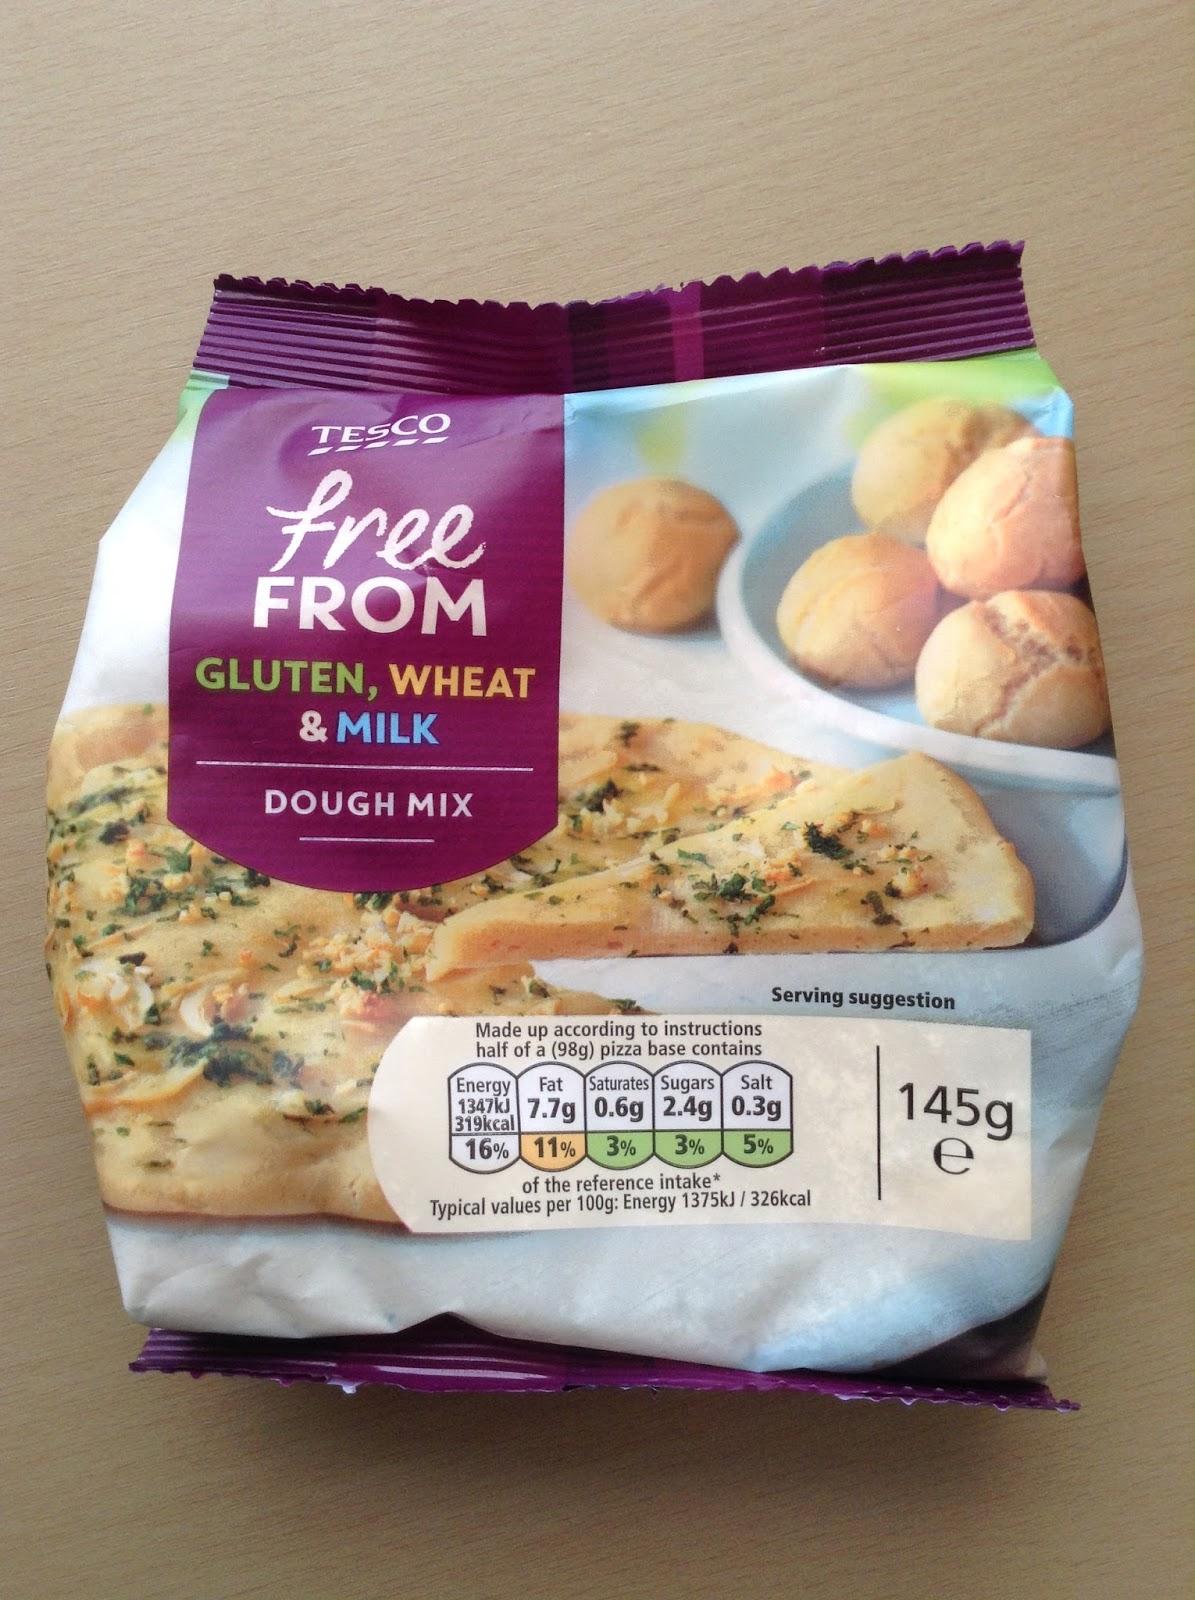 Violife Original Vegan Cheese Tesco Free From Dough Mix